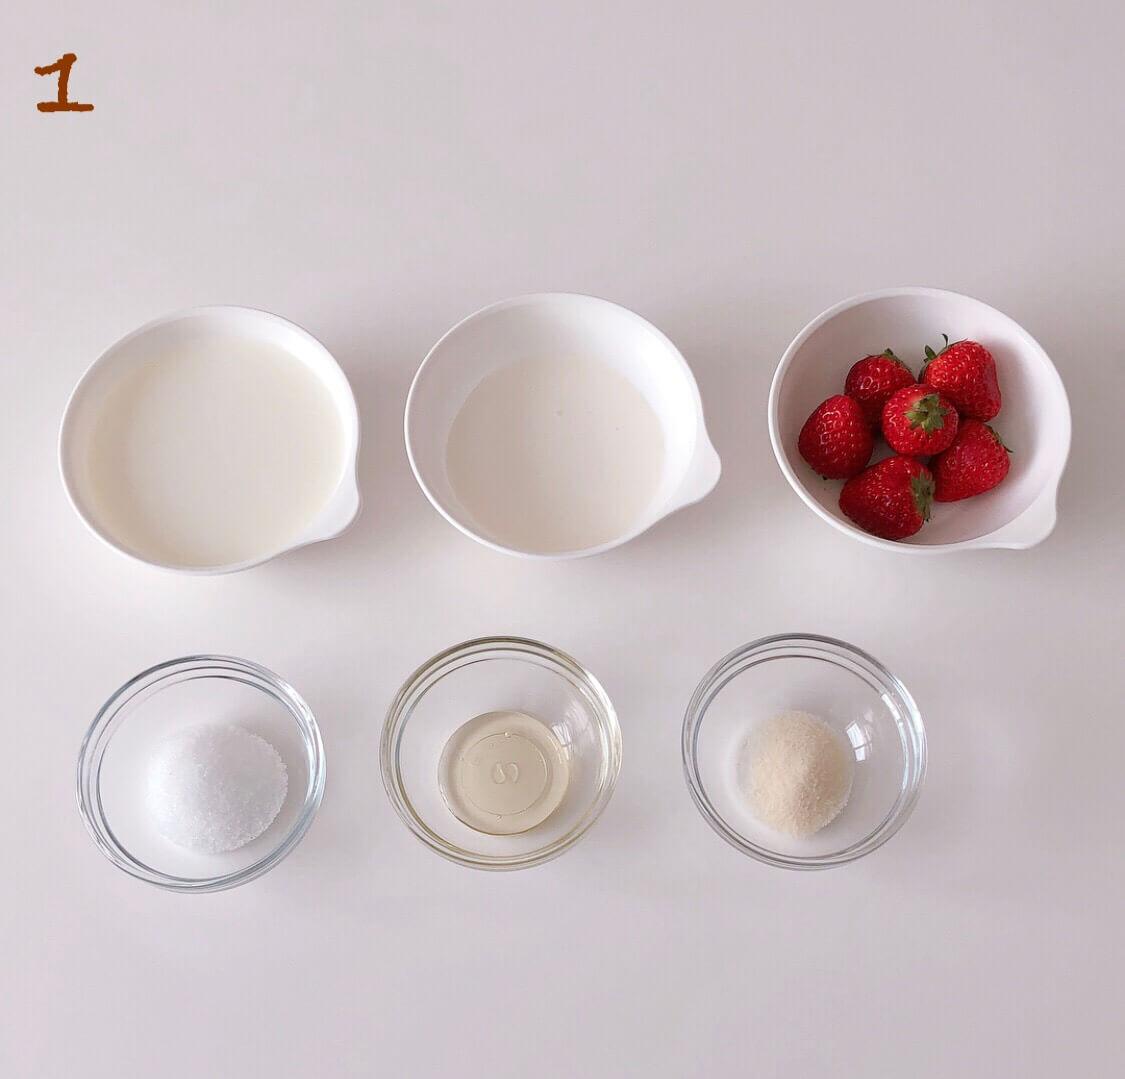 %e3%82%ad%e3%83%86%e3%82%a3-%e3%82%b9%e3%82%a4%e3%83%bc%e3%83%84-%e3%83%ac%e3%82%b7%e3%83%92%e3%82%9a-kitty-sweets-recipe-%e5%87%b1%e8%92%82%e7%8c%ab-%e7%94%9c%e9%bb%9e-%e9%a3%9f%e8%ad%9c1-2